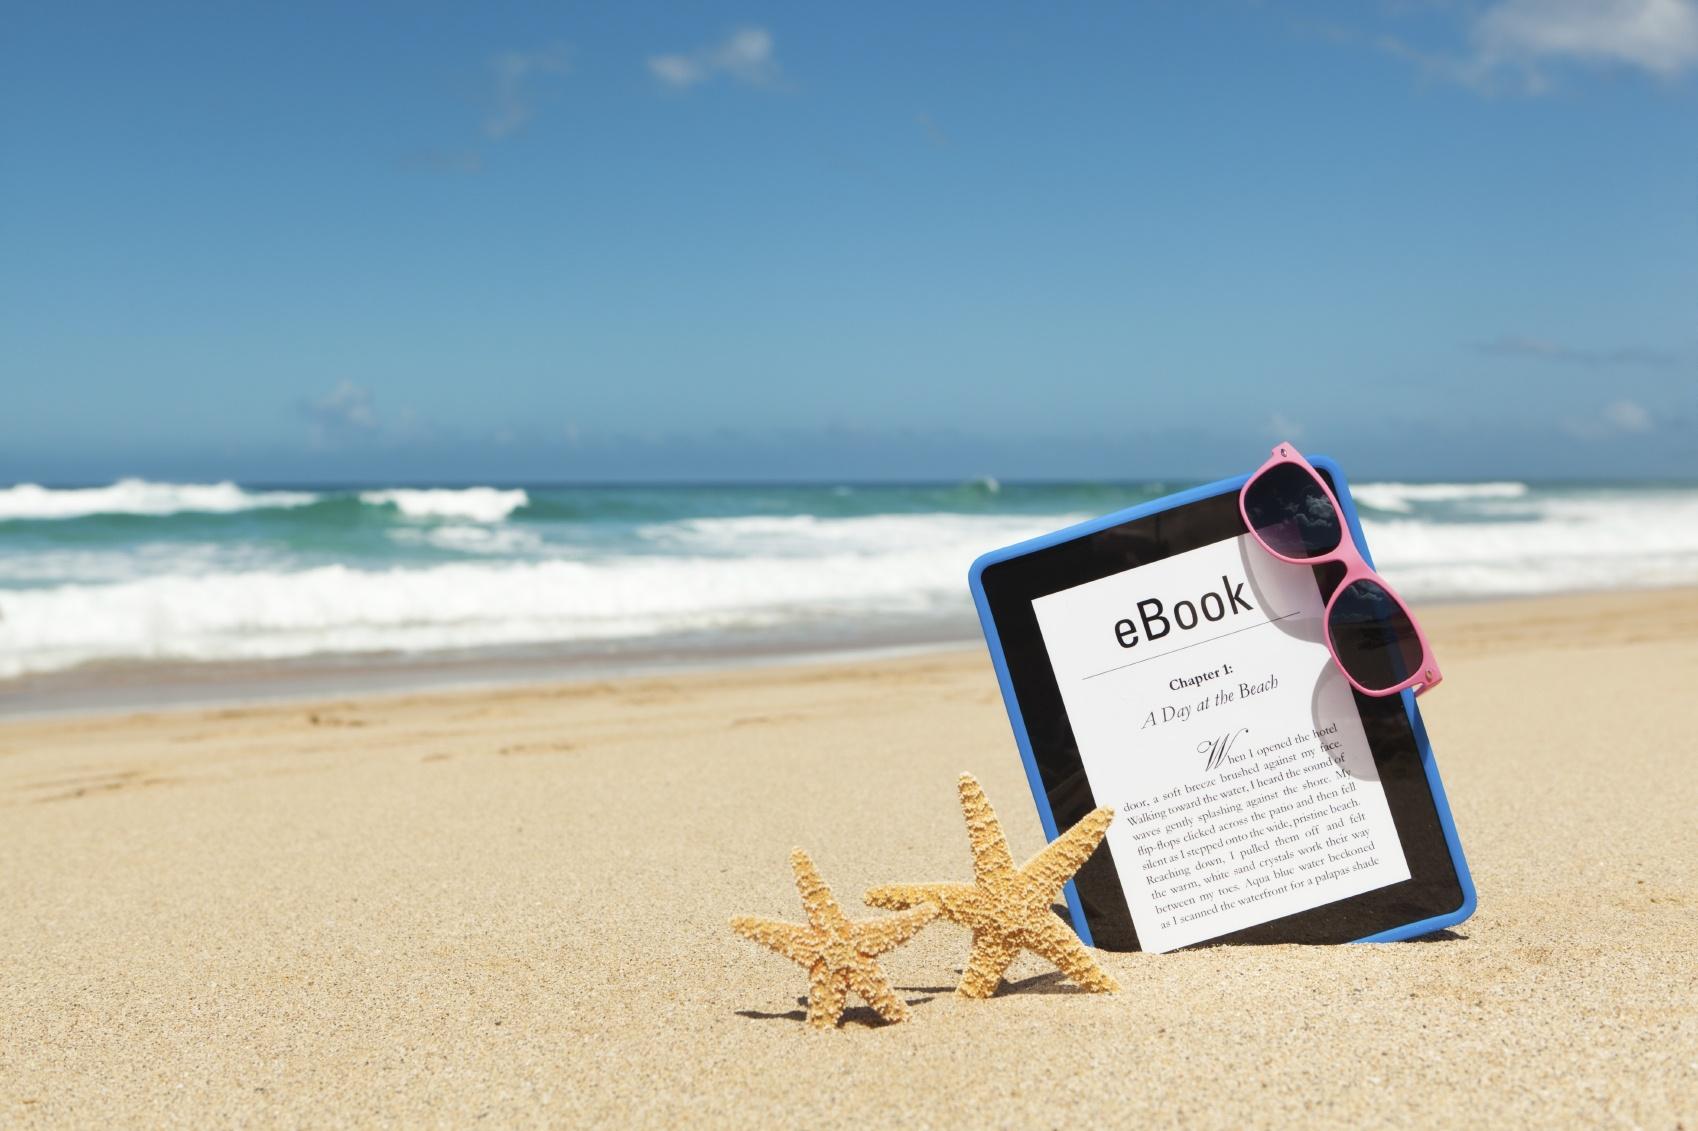 Voglia di relax, voglia di ebook